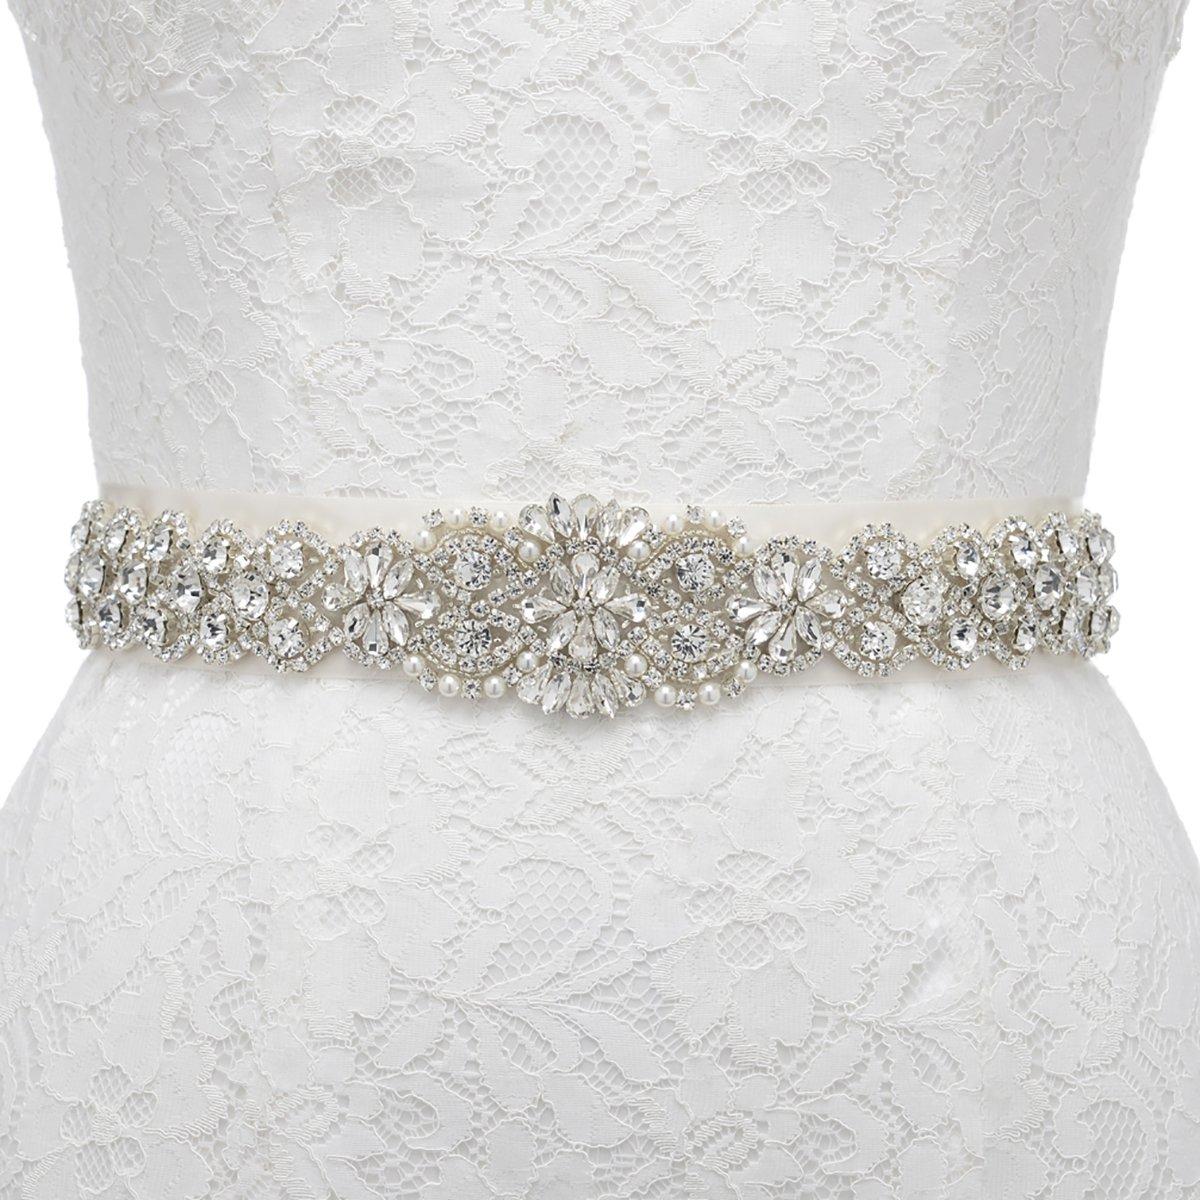 Remedios Sparkling Rhinestone Satin Ribbon Sash Belt for Wedding Evening Party Dress,Ivory Ribbon